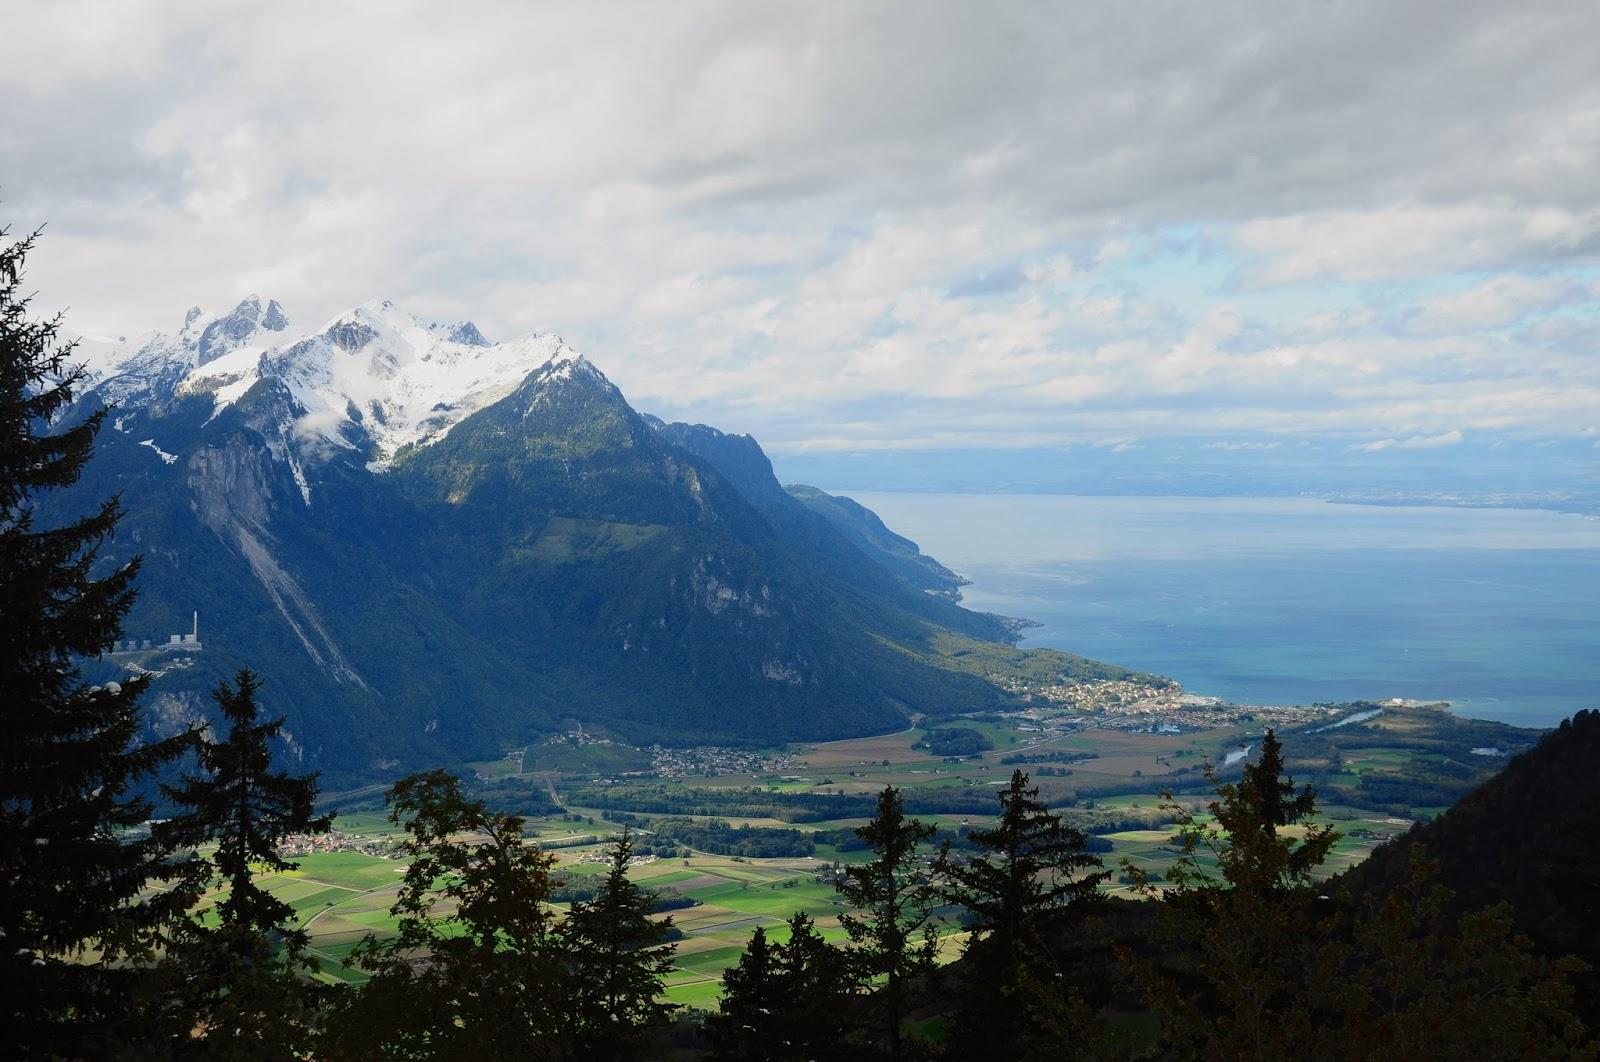 La Grande Crevasse Vaud randonné hiking Leysin